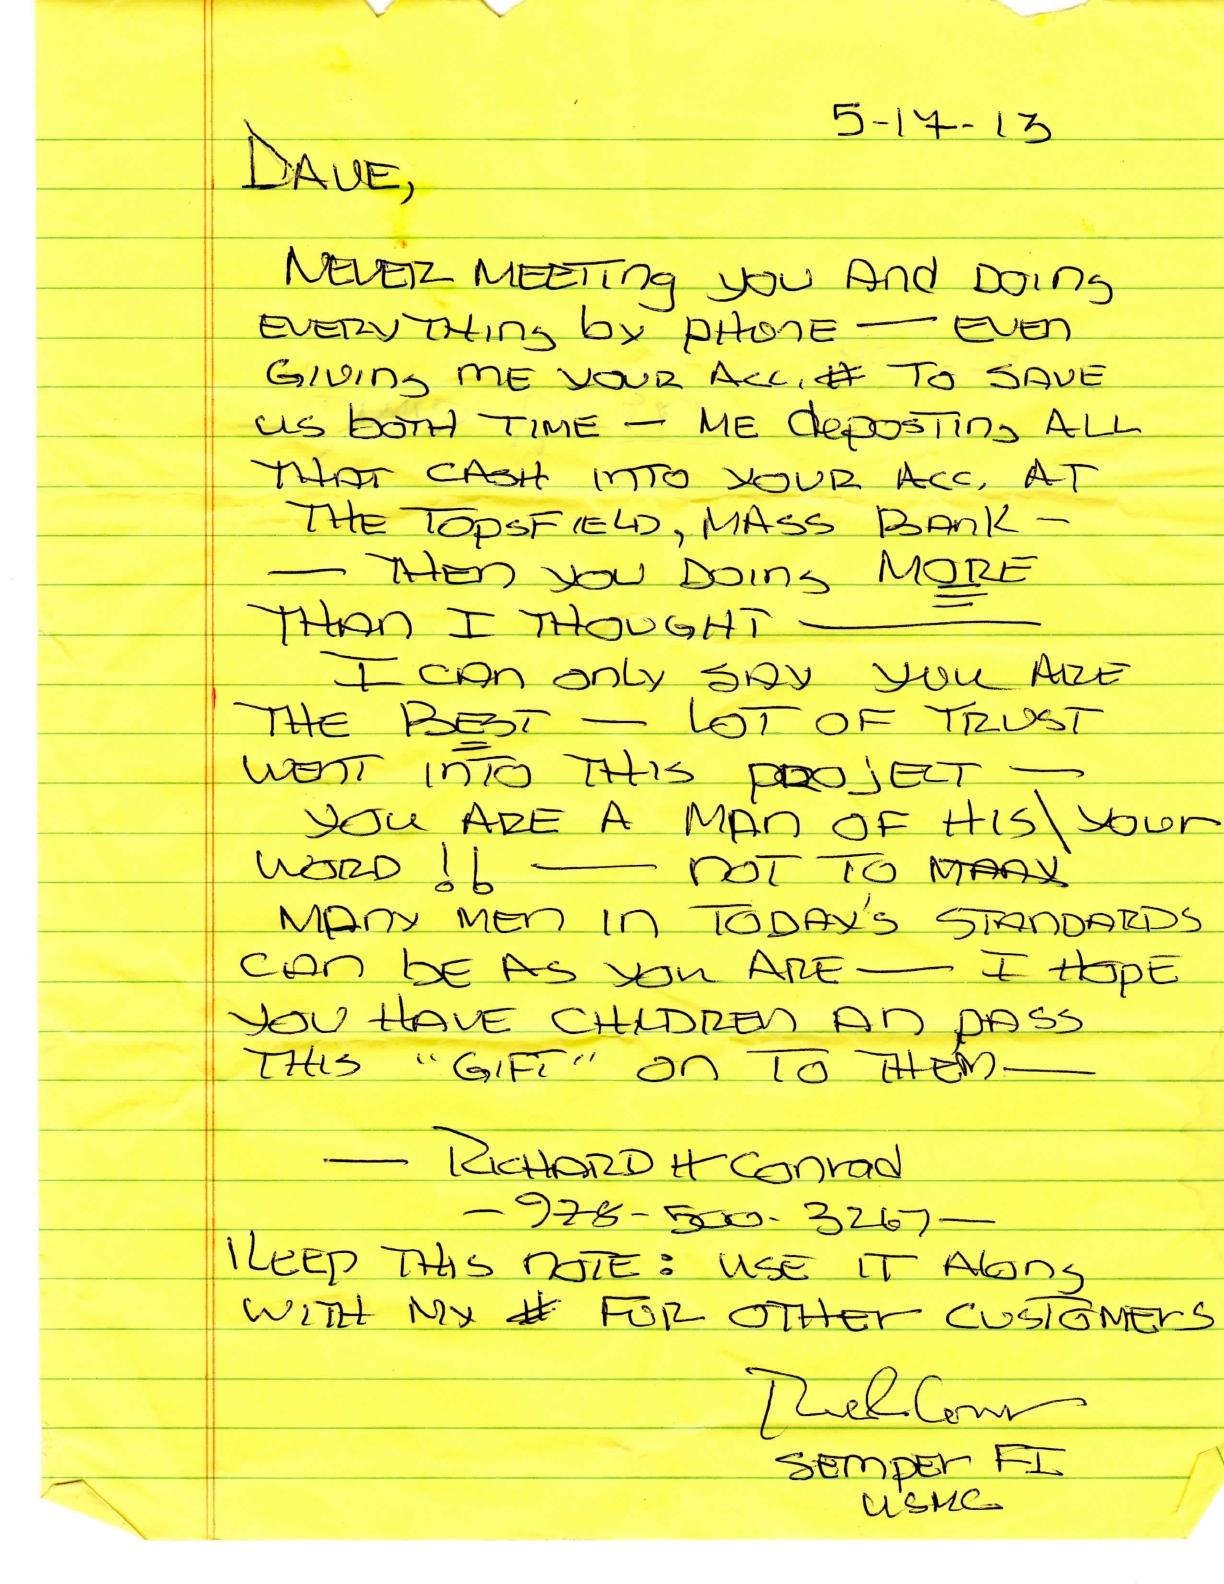 Testimonial Richard Conrad